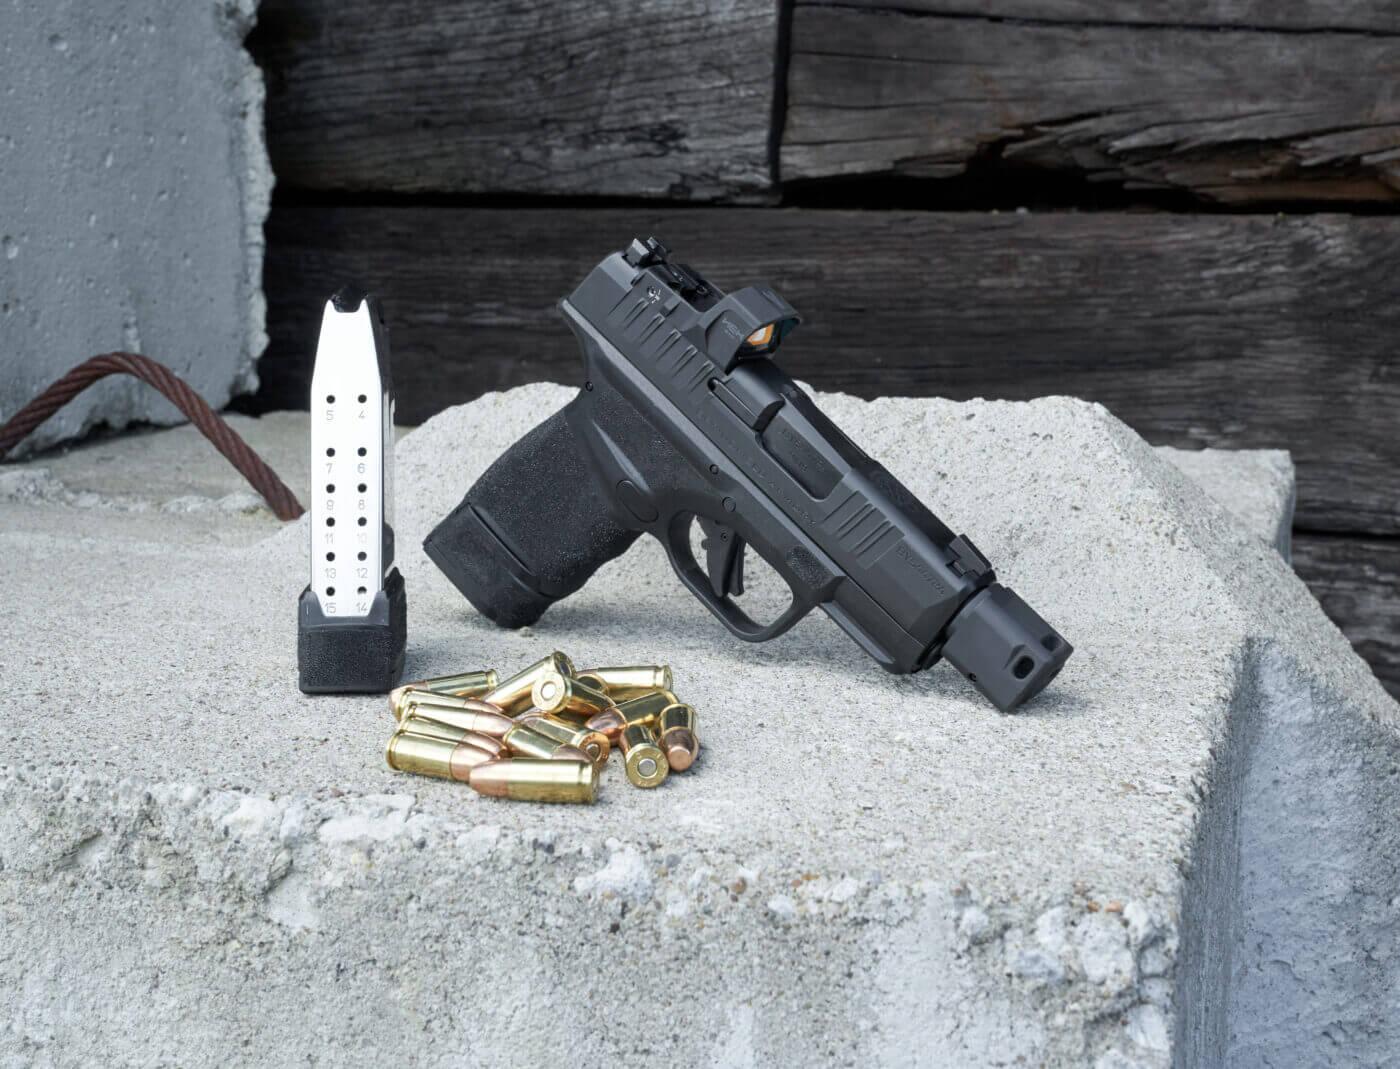 Springfield Hellcat pistol with 15-round magazine and ammo